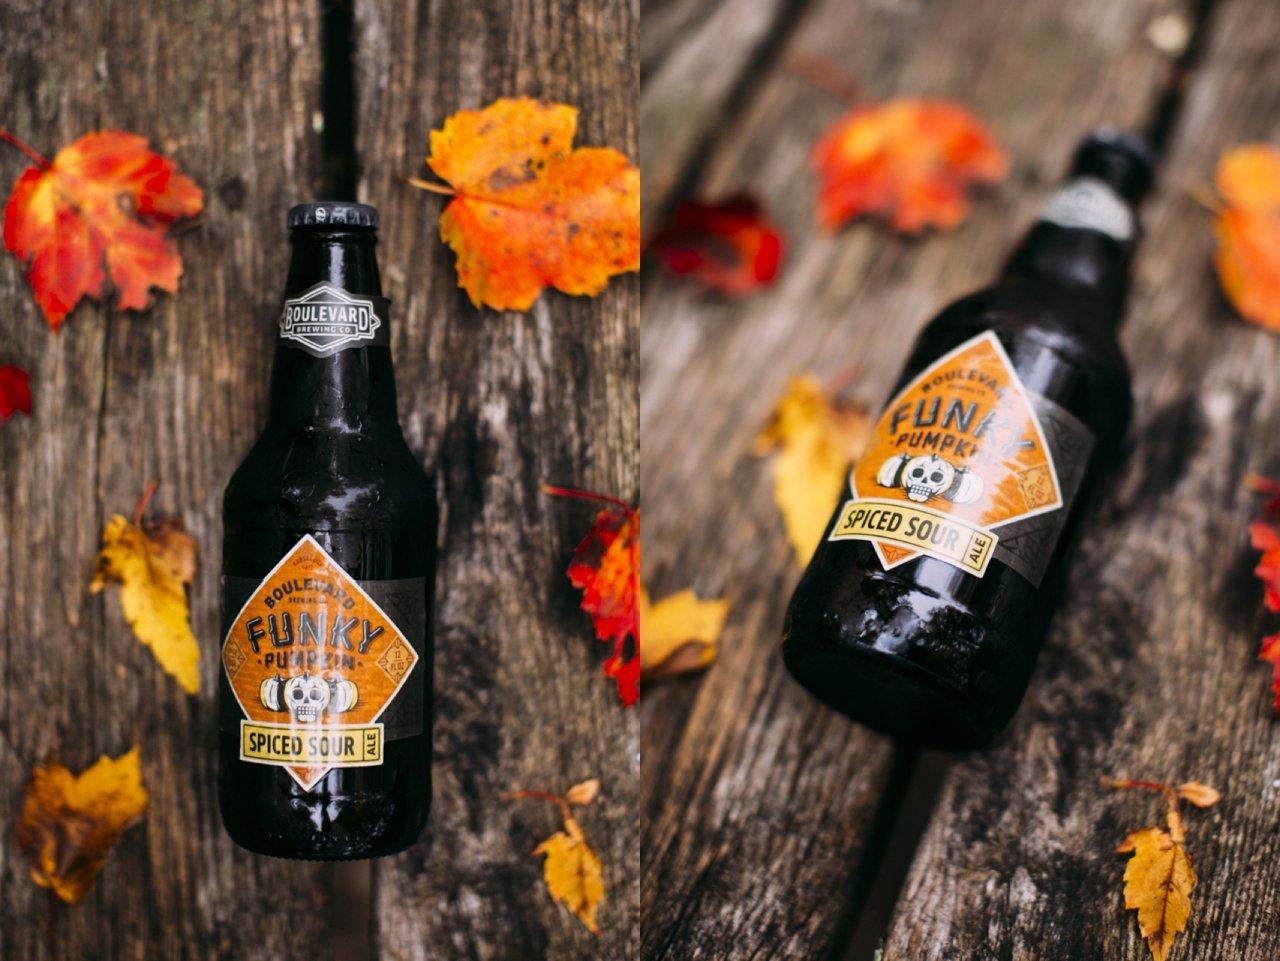 Funky Pumpkin Spiced Sour Beer